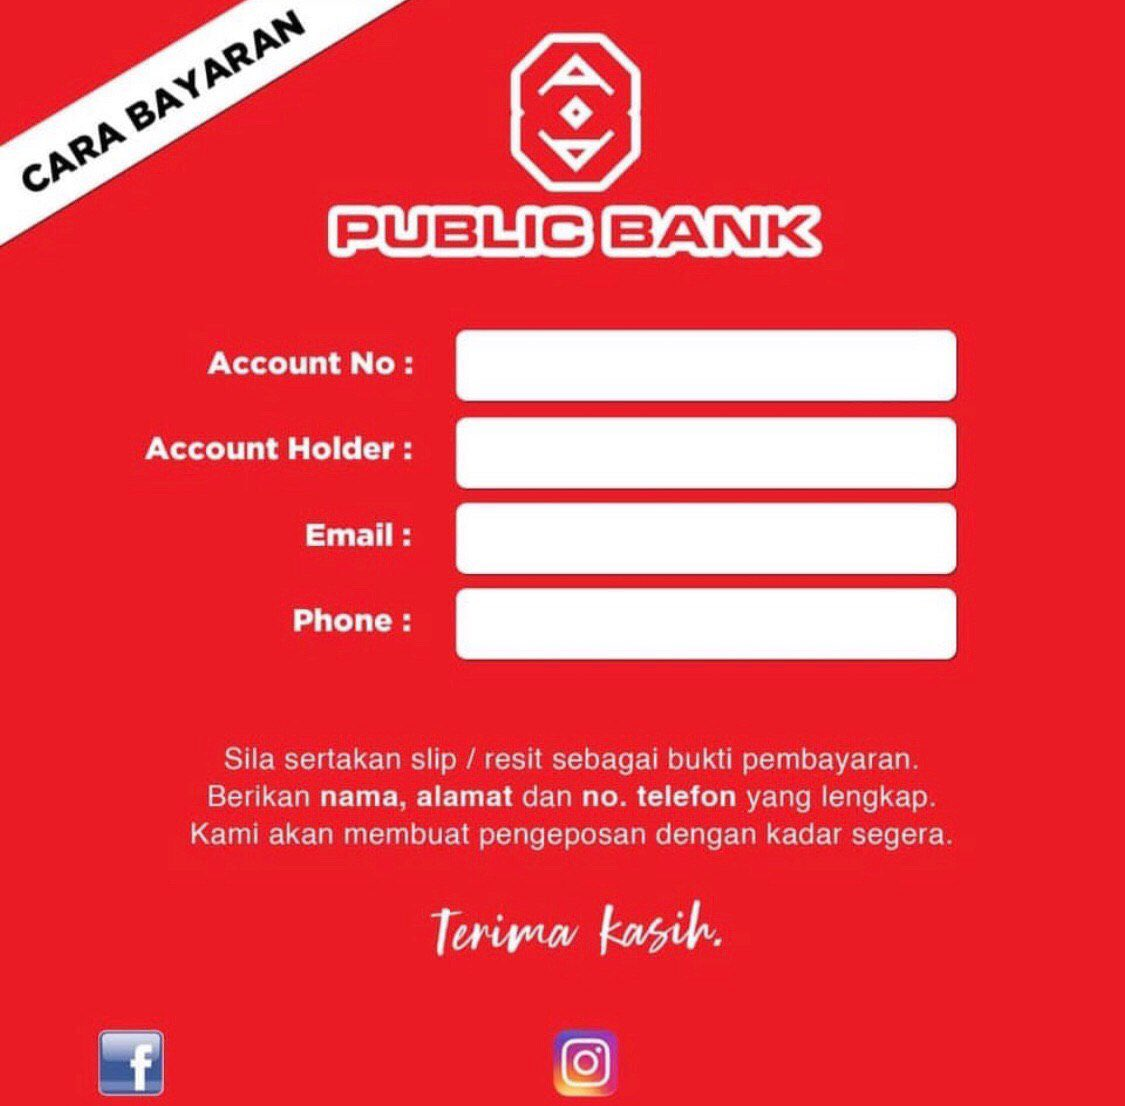 Fp Boss On Twitter Hai Gais So Harini Bos Nak Share Template Acc Bank Untuk Korang Letak No Acc Korang Takdelah Lepasni Terkial2 Nak Bukak Apps Then Ss No Acc Korang Kalau